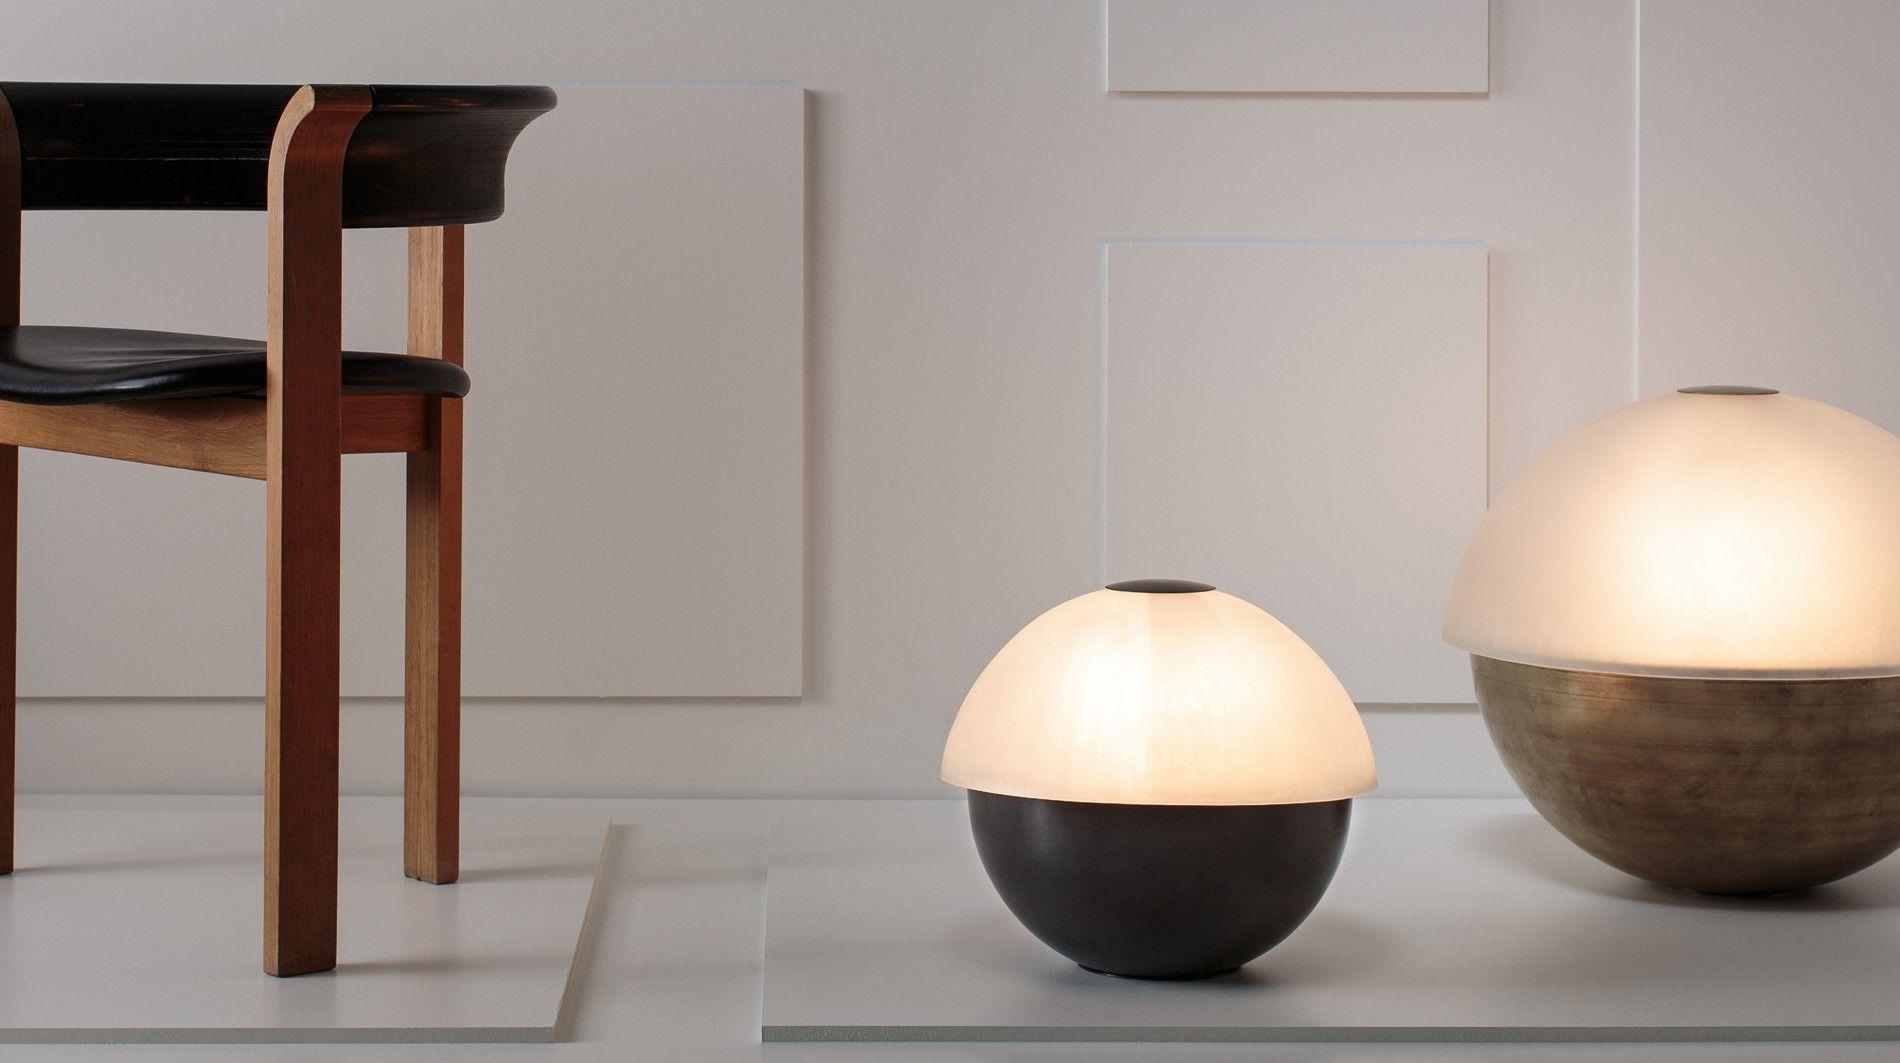 Apparatus | My Design Agenda | #lightingdesign #modernlighting #contemporarylighting #luxurylighting #luxurychandelier #interiordesignshow #lightdesign #timeless #lightingbrands